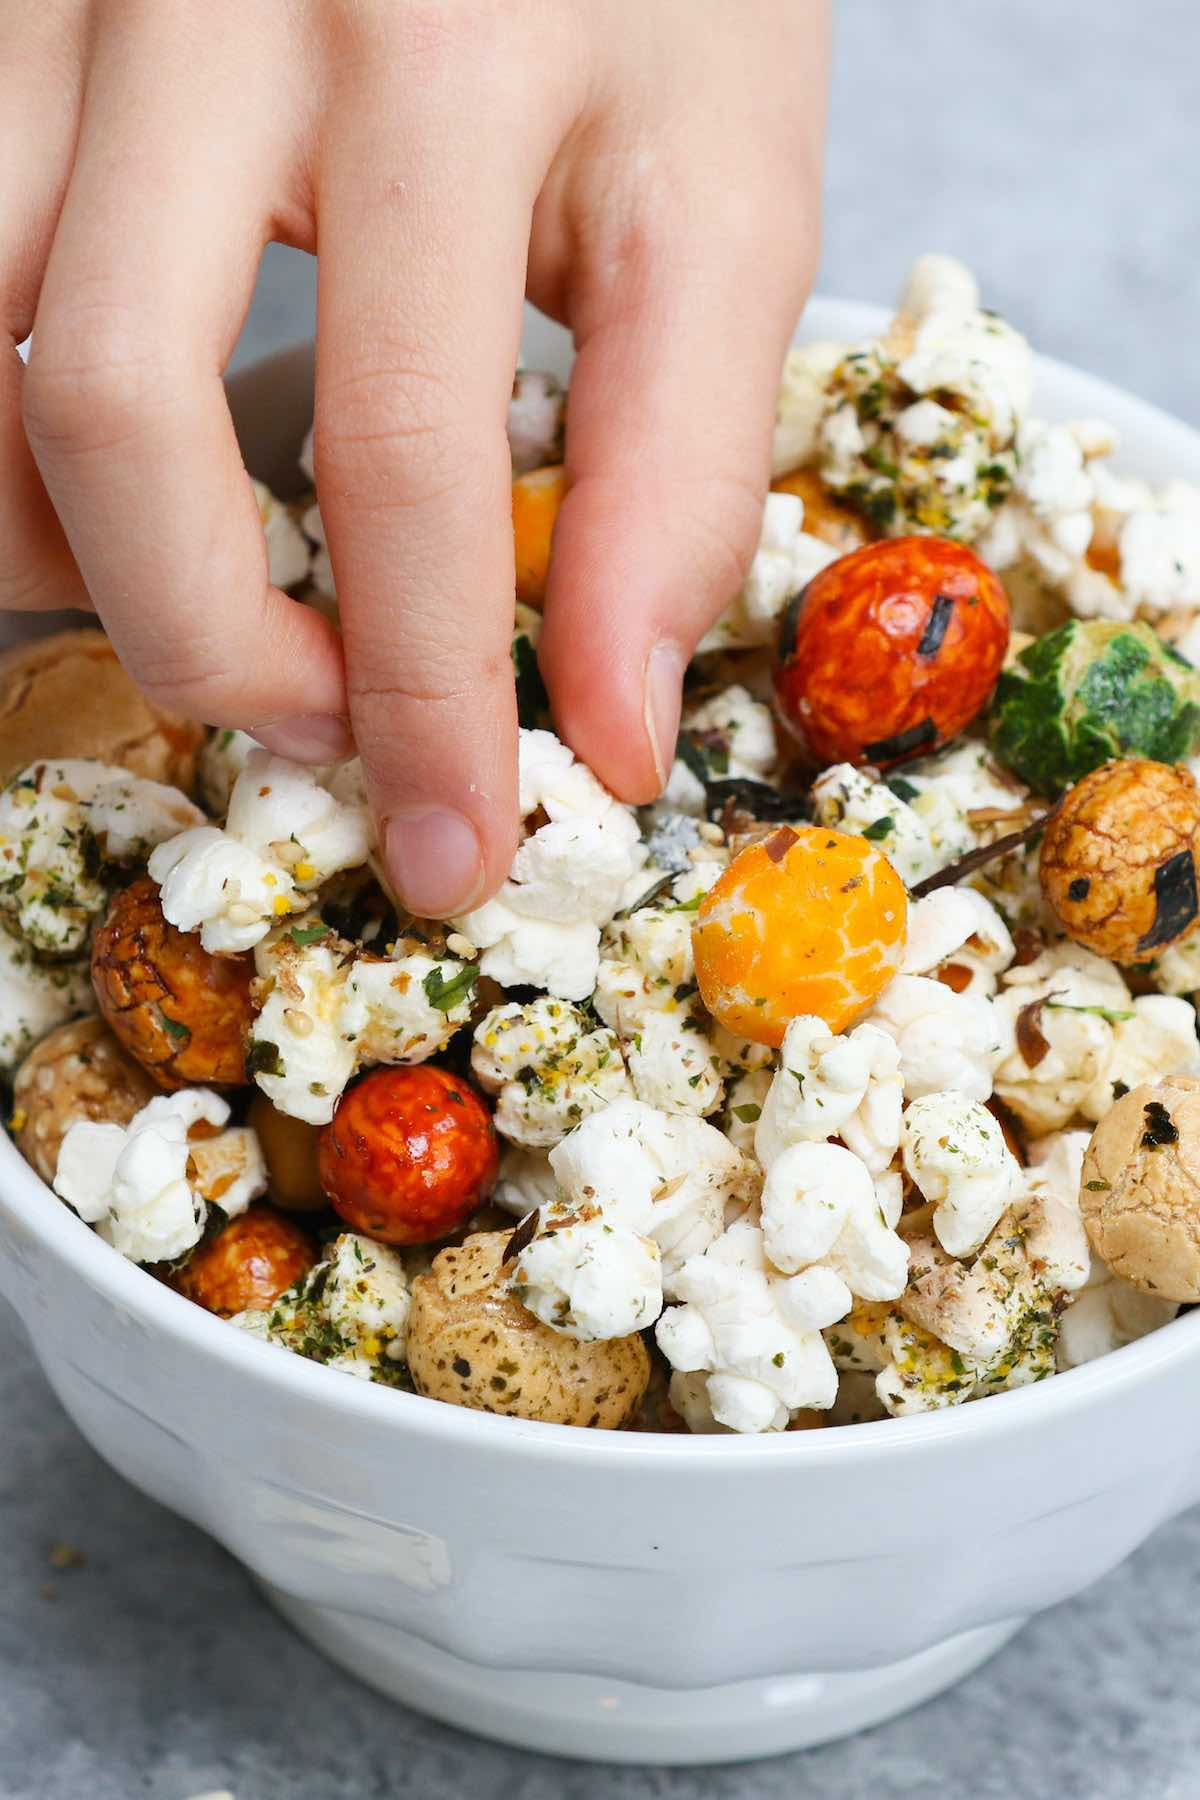 A colorful serving bowl full of Hawaiian popcorn #HurricanePopcorn #HawaiianHurricanePopcorn